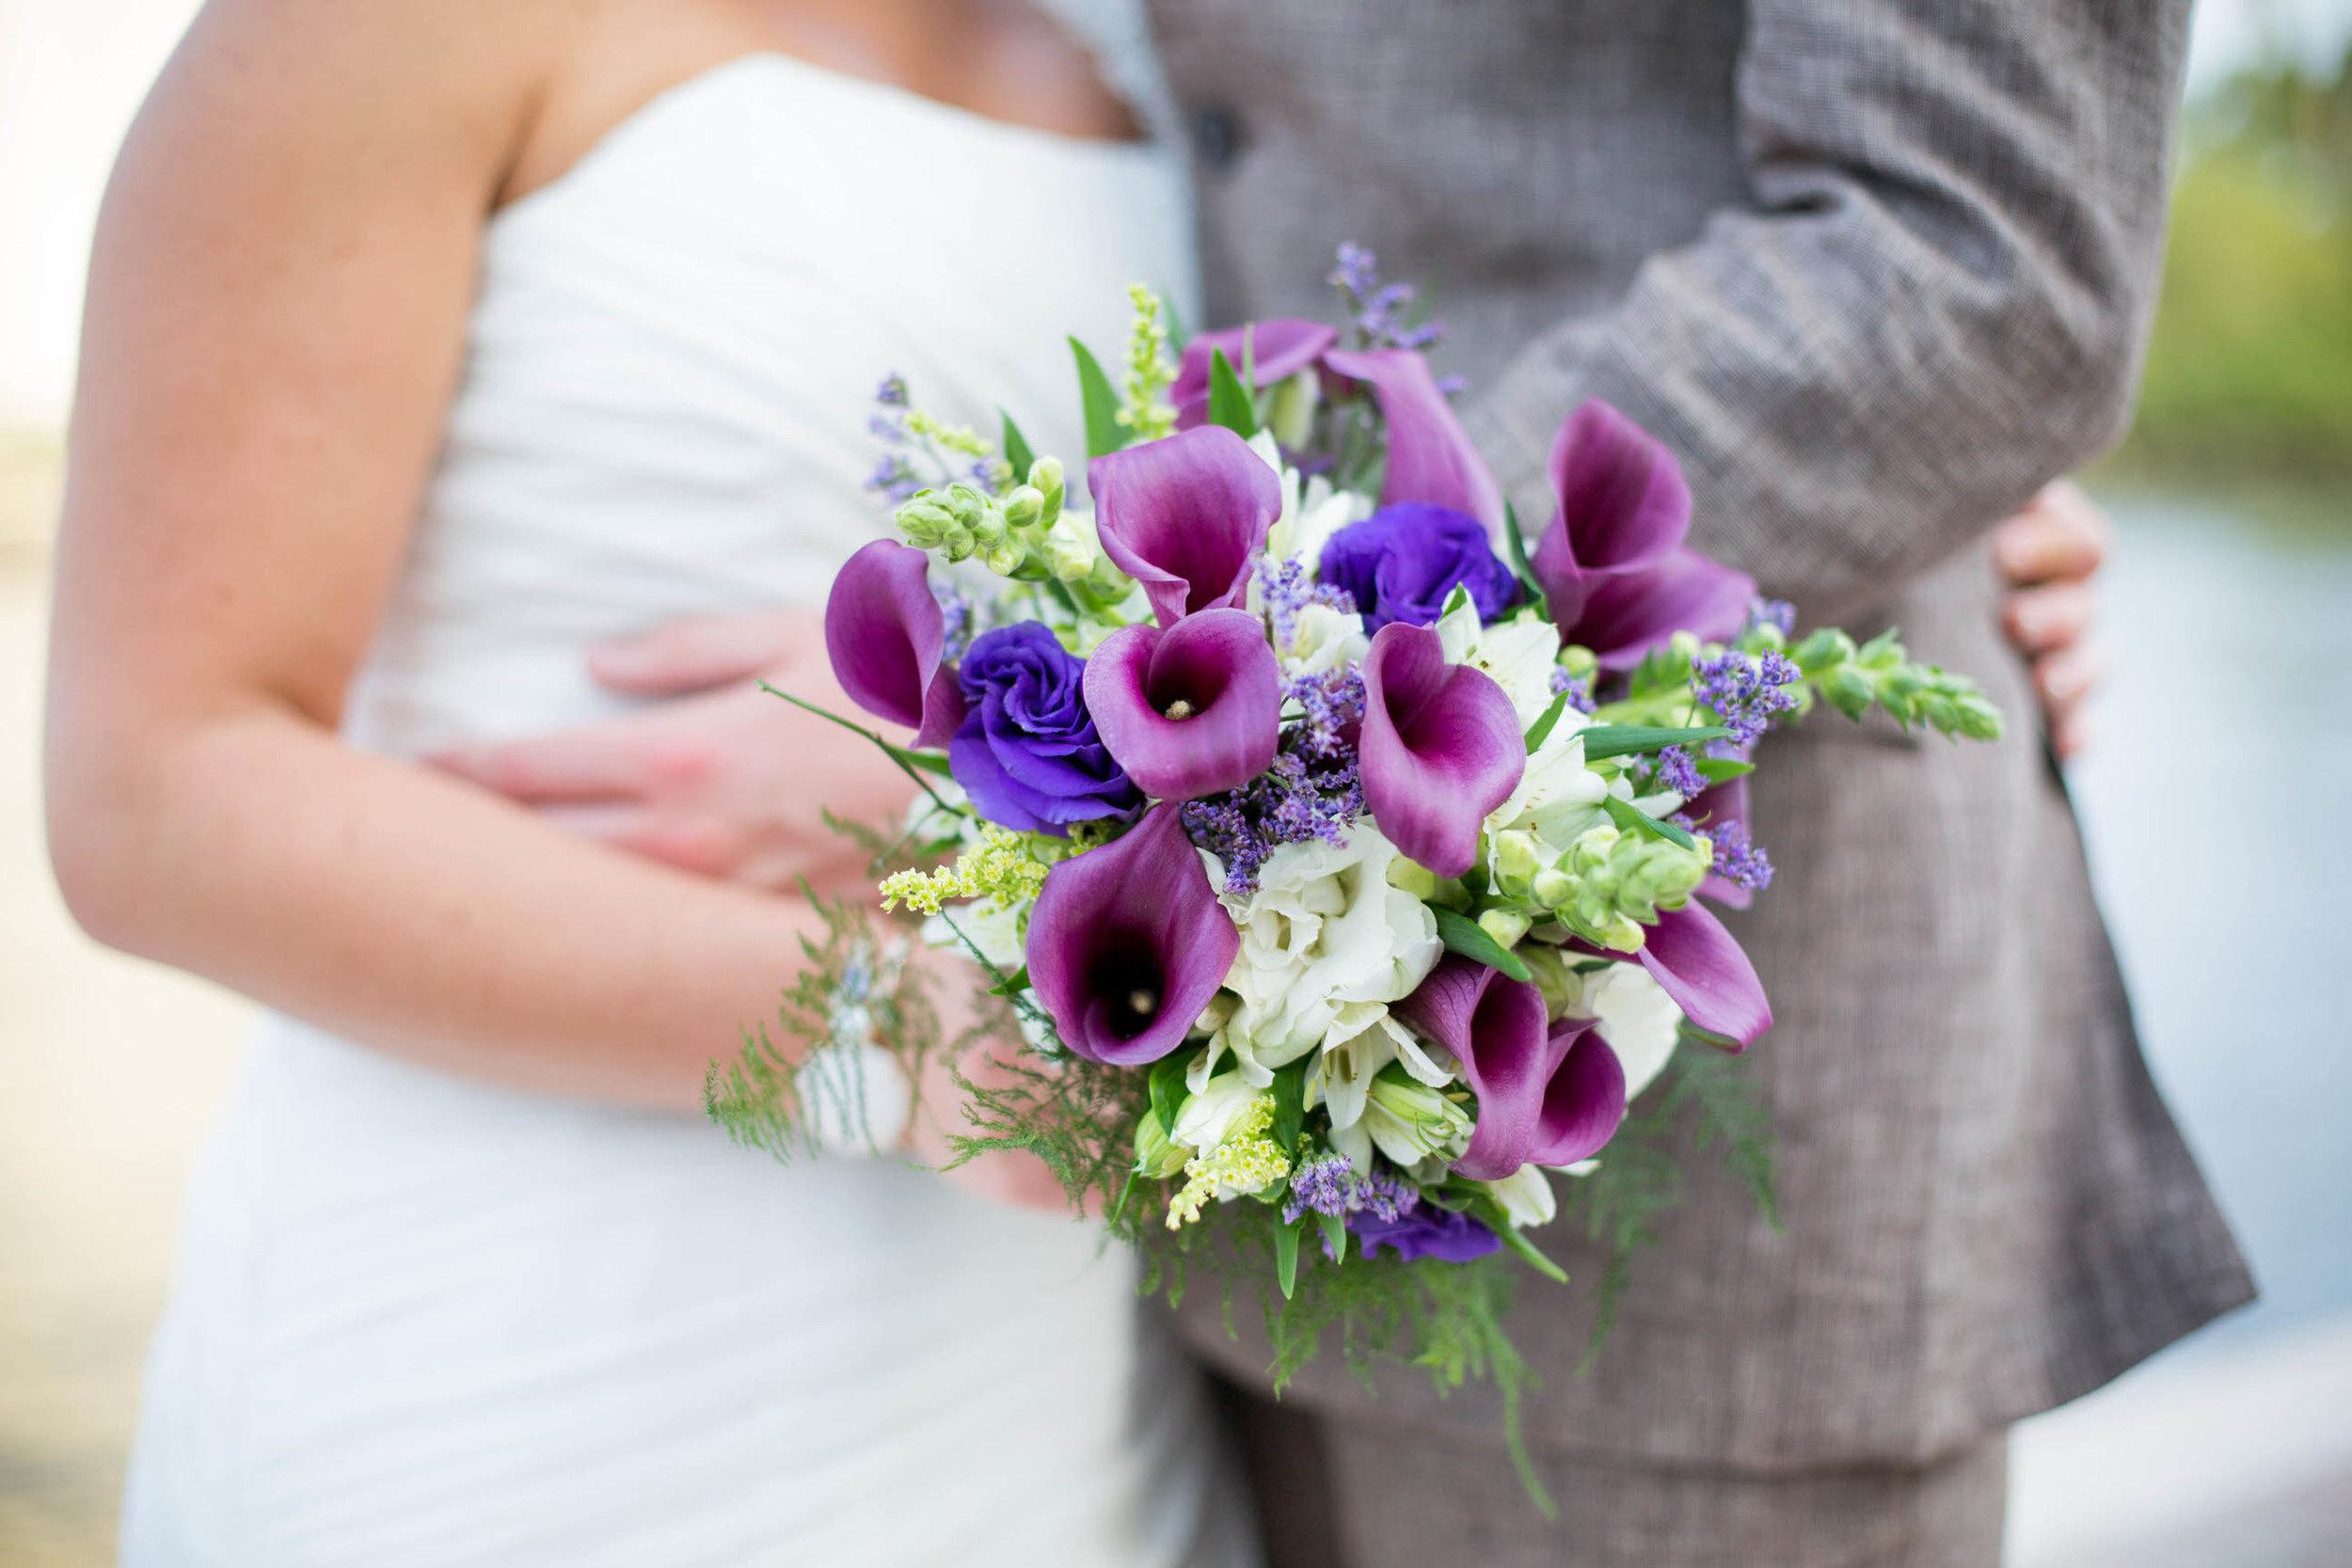 couple-wedding-flowers-tiny-house-photo-details.jpg